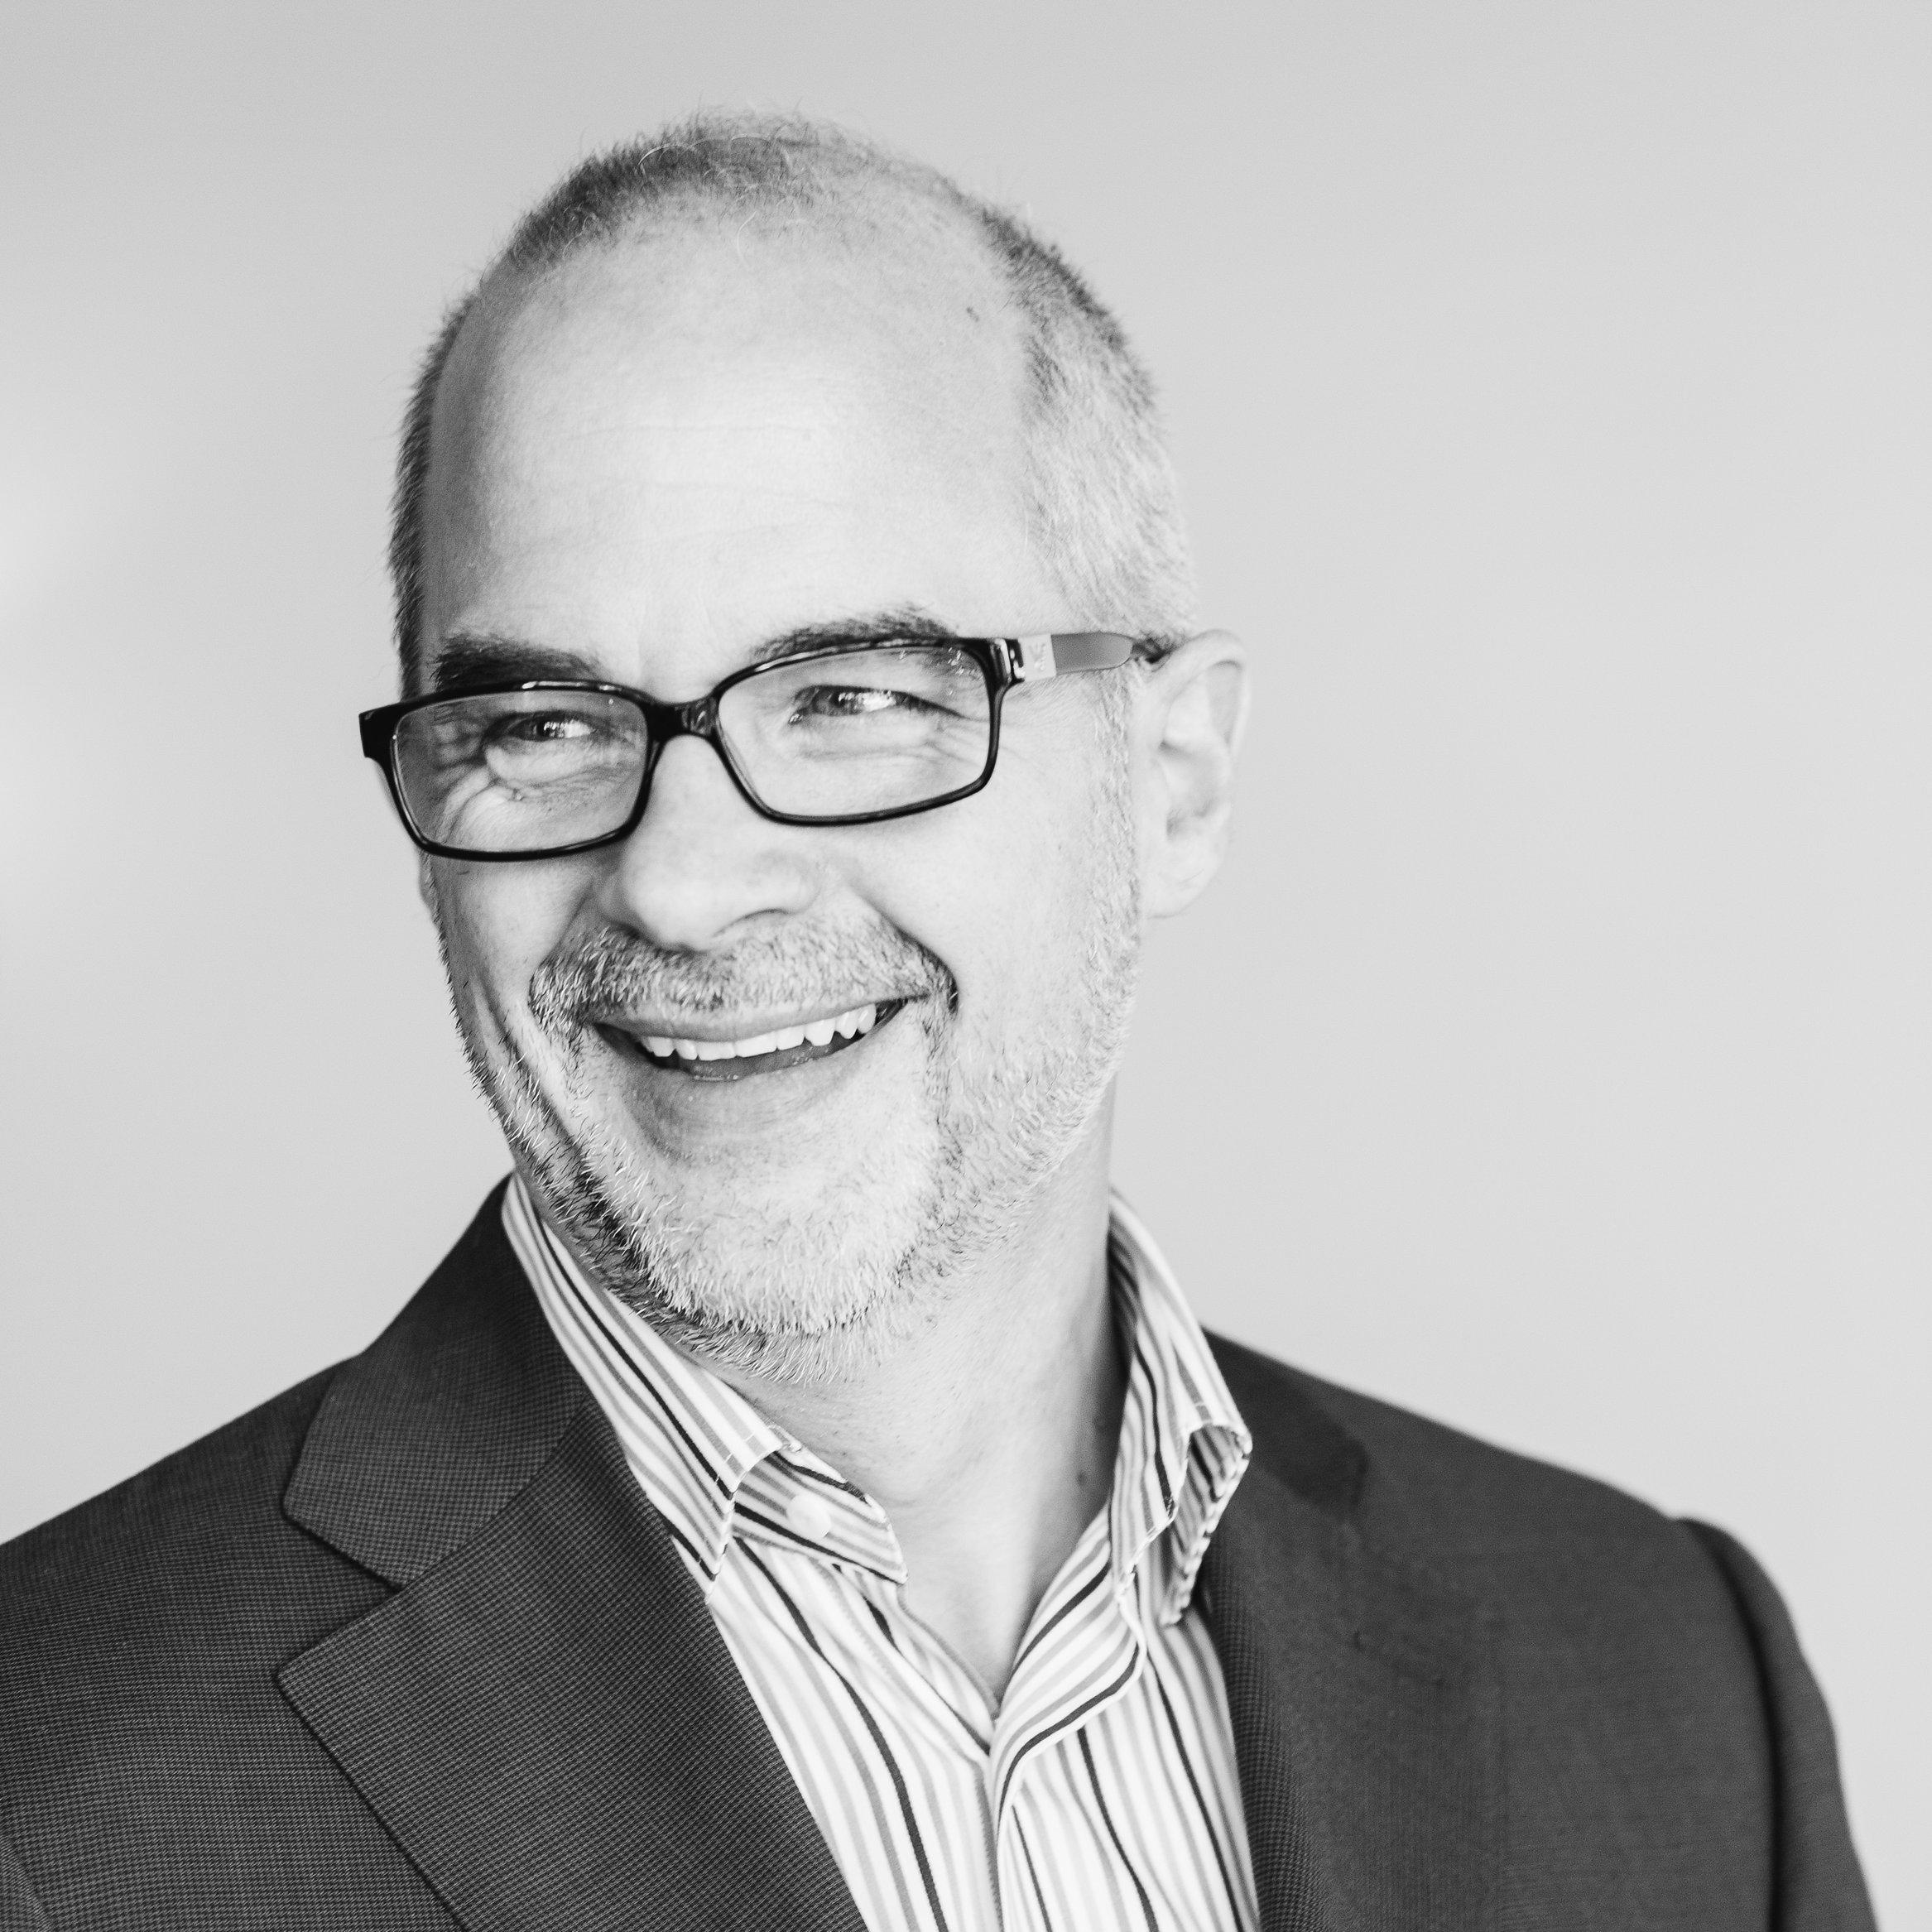 Black and white headshot photo of Jeff Shore, speaker